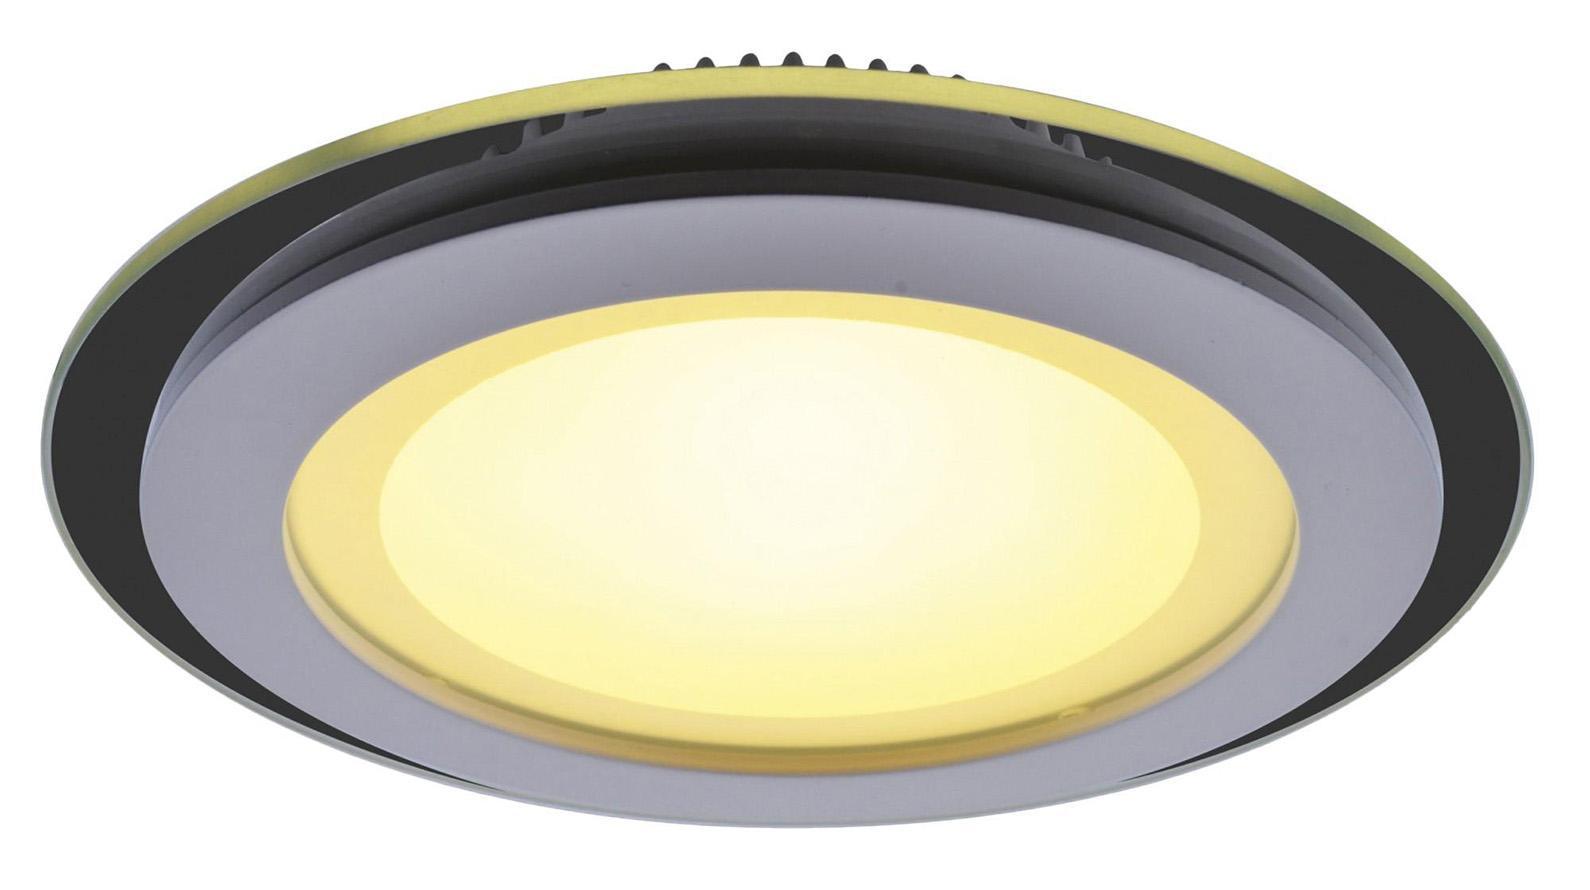 A4112PL-1WH RAGGIO Встраиваемый светильникA4112PL-1WH12W LED; 960 lm Материал: Арматура: Алюминий / Элемент декора: СтеклоРазмер: 160x160x45Цвет: Белый